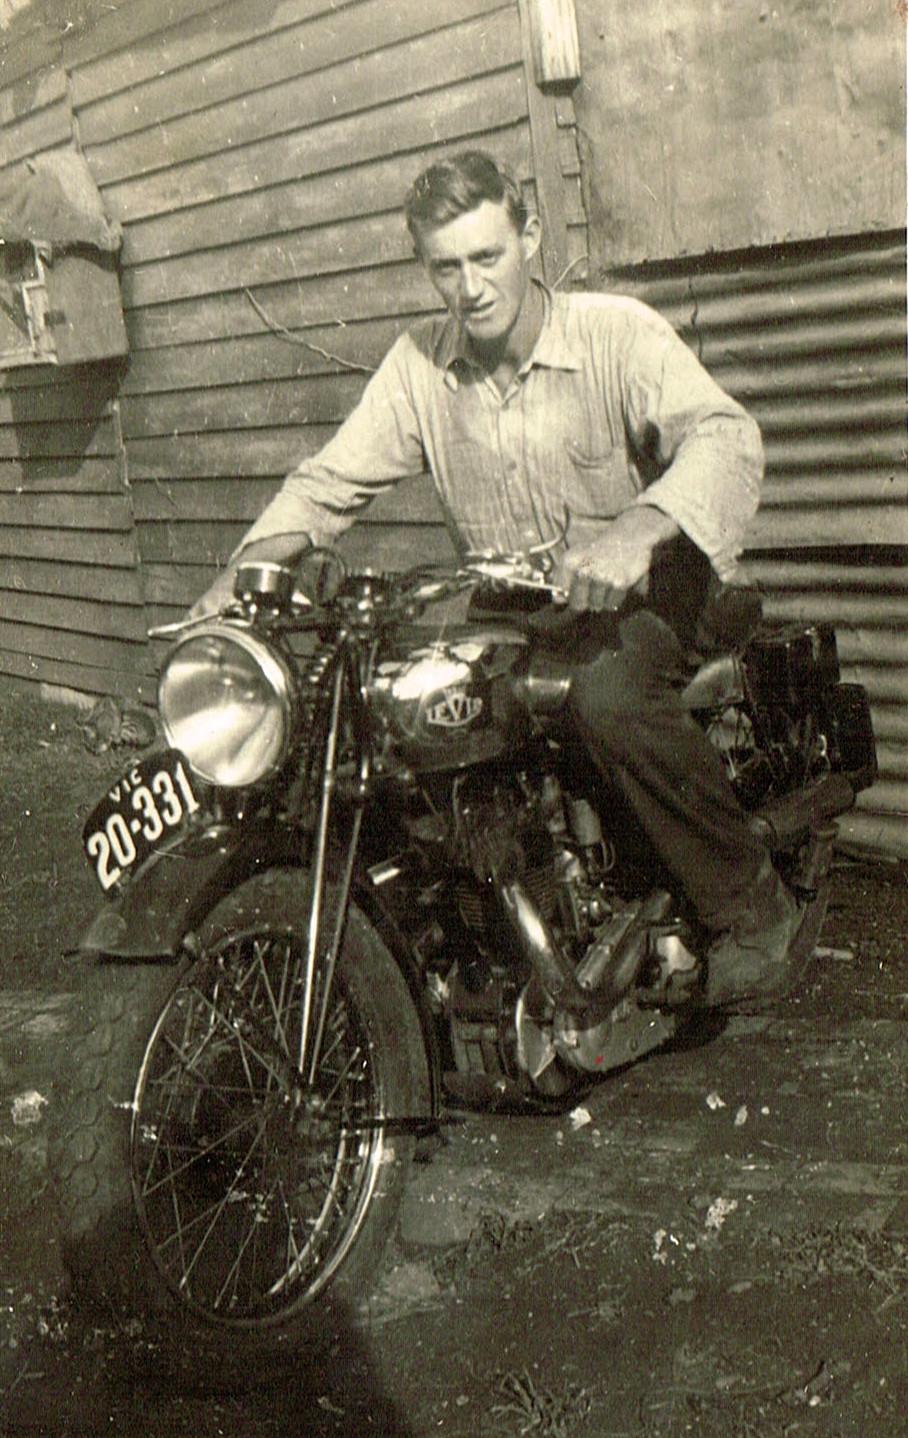 Bobby Wilson on motorbike